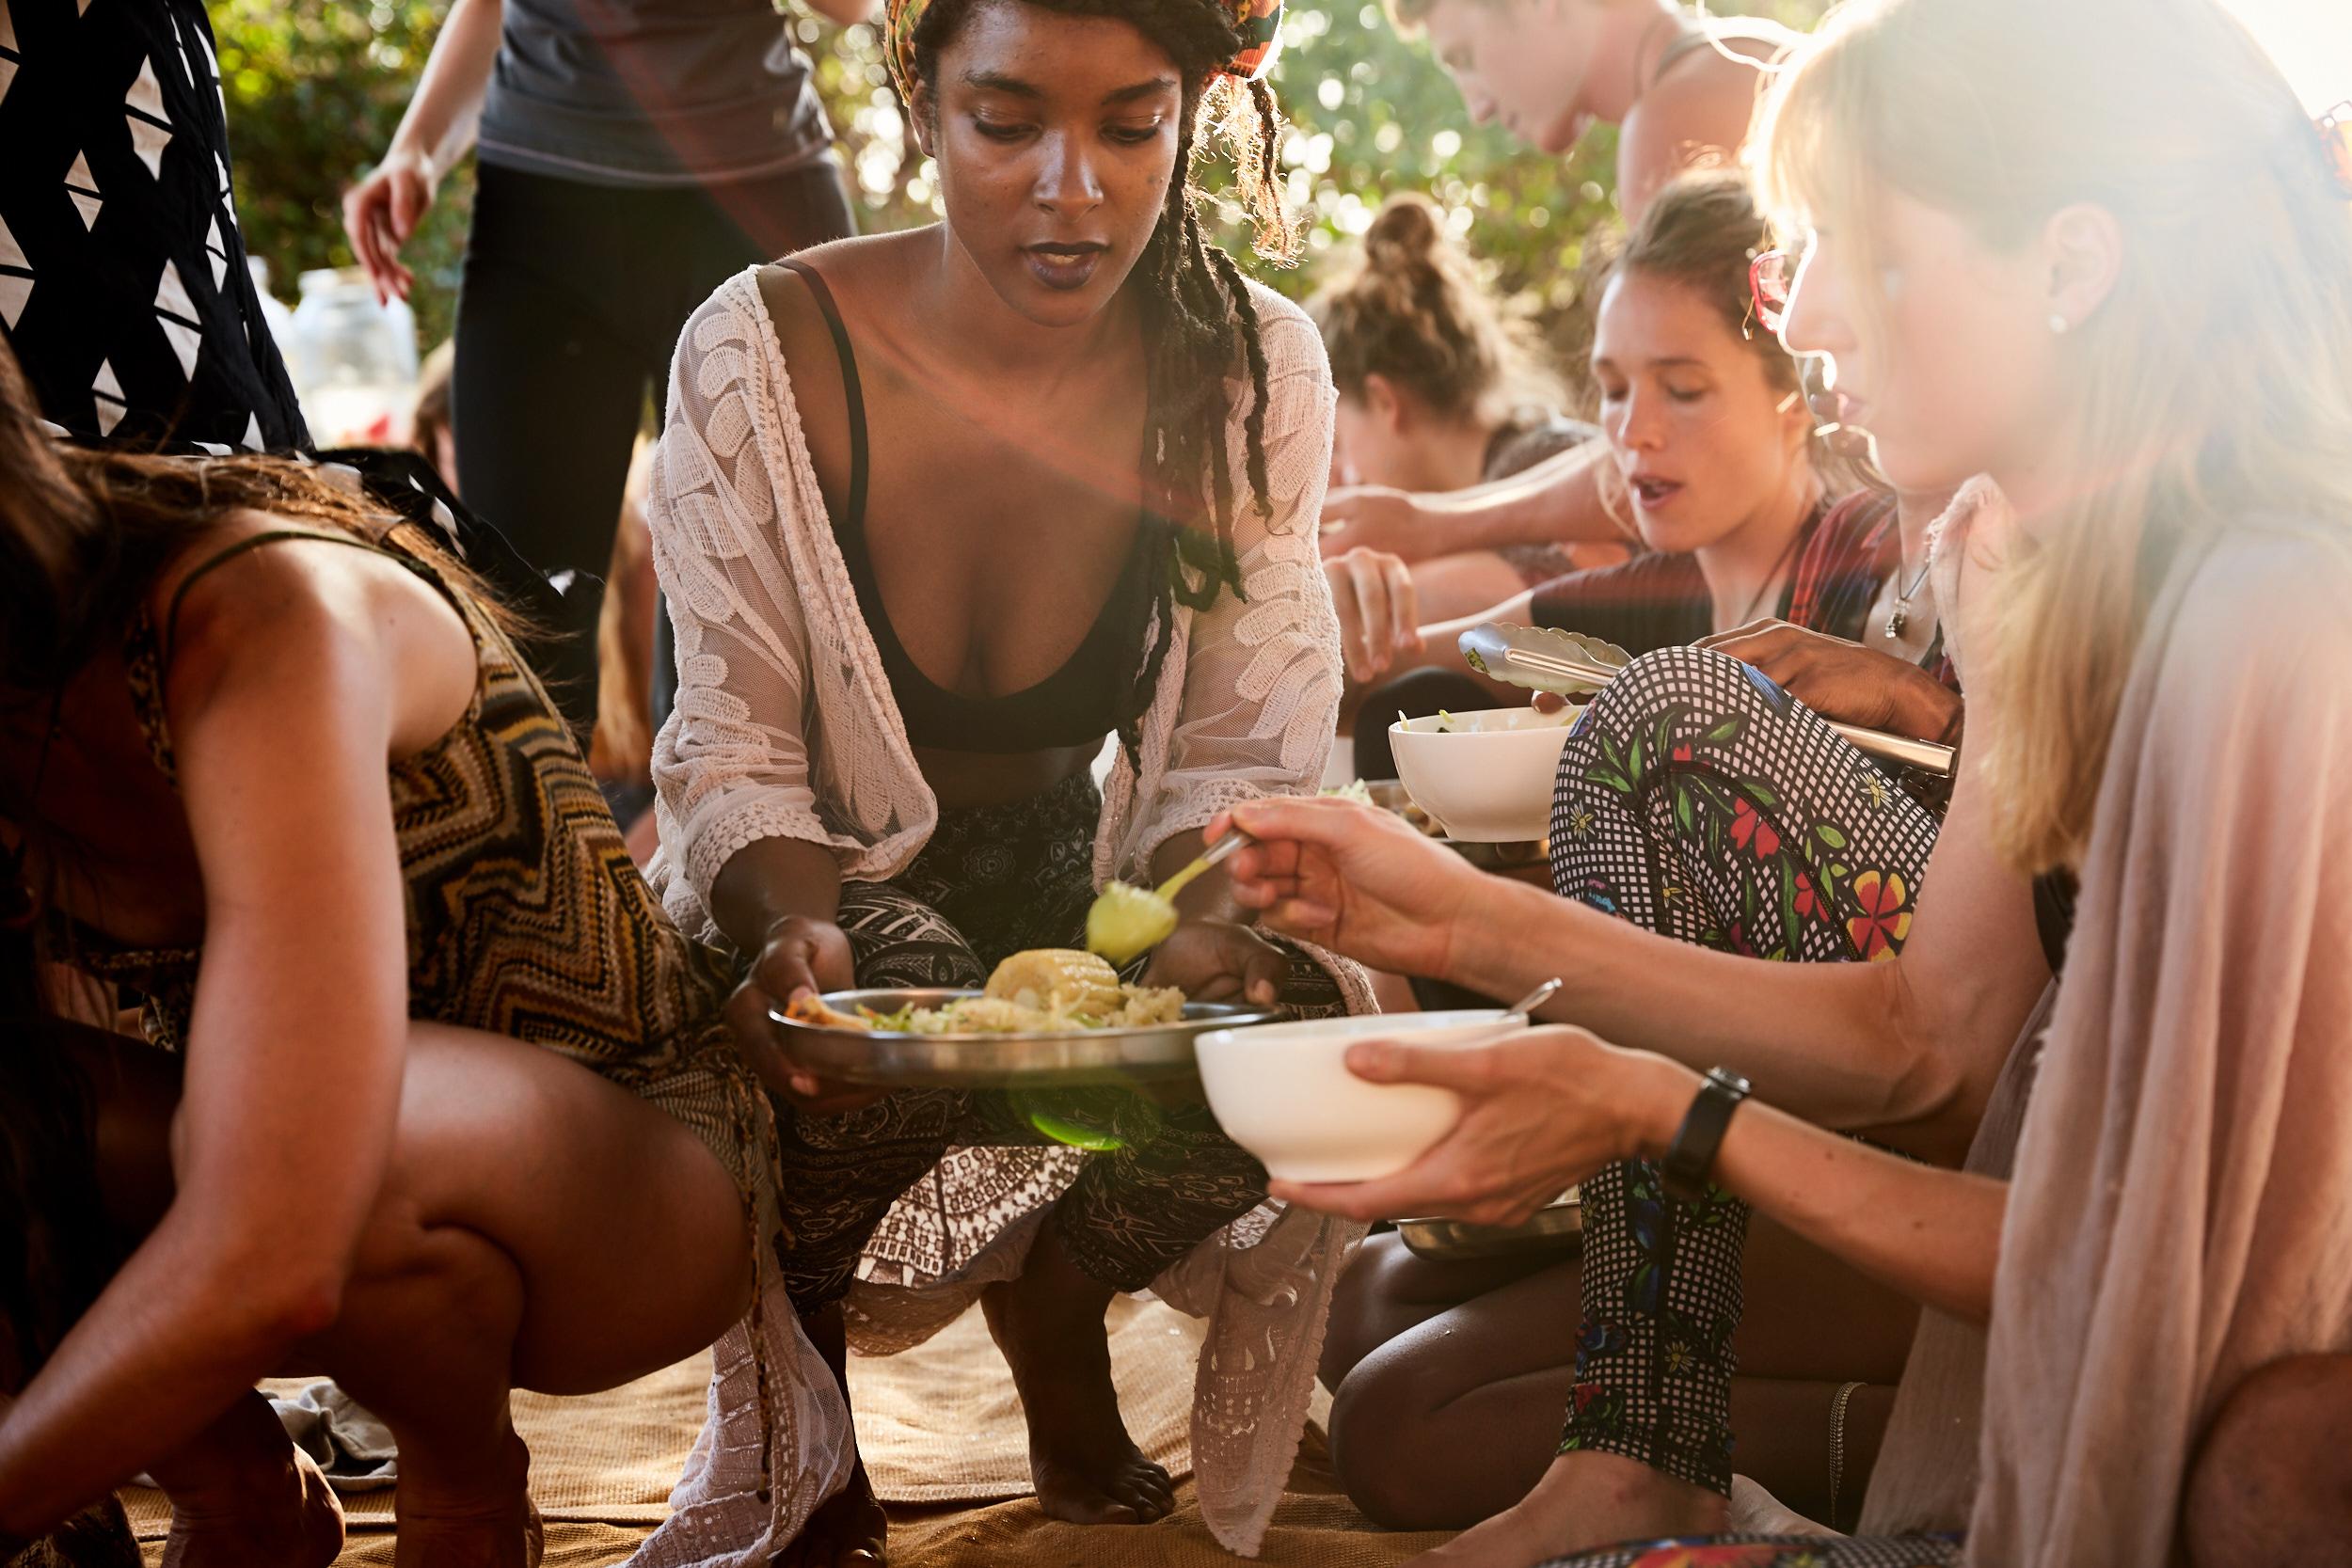 Dinner at Costa Rica Yoga Teacher Training with Shivakali Yoga, at Nalu, Nosara.  Costa Rica-based Vinyasa Yoga Teacher Training and Yoga Certification Program that Certifies Yoga Teachers on Retreat.